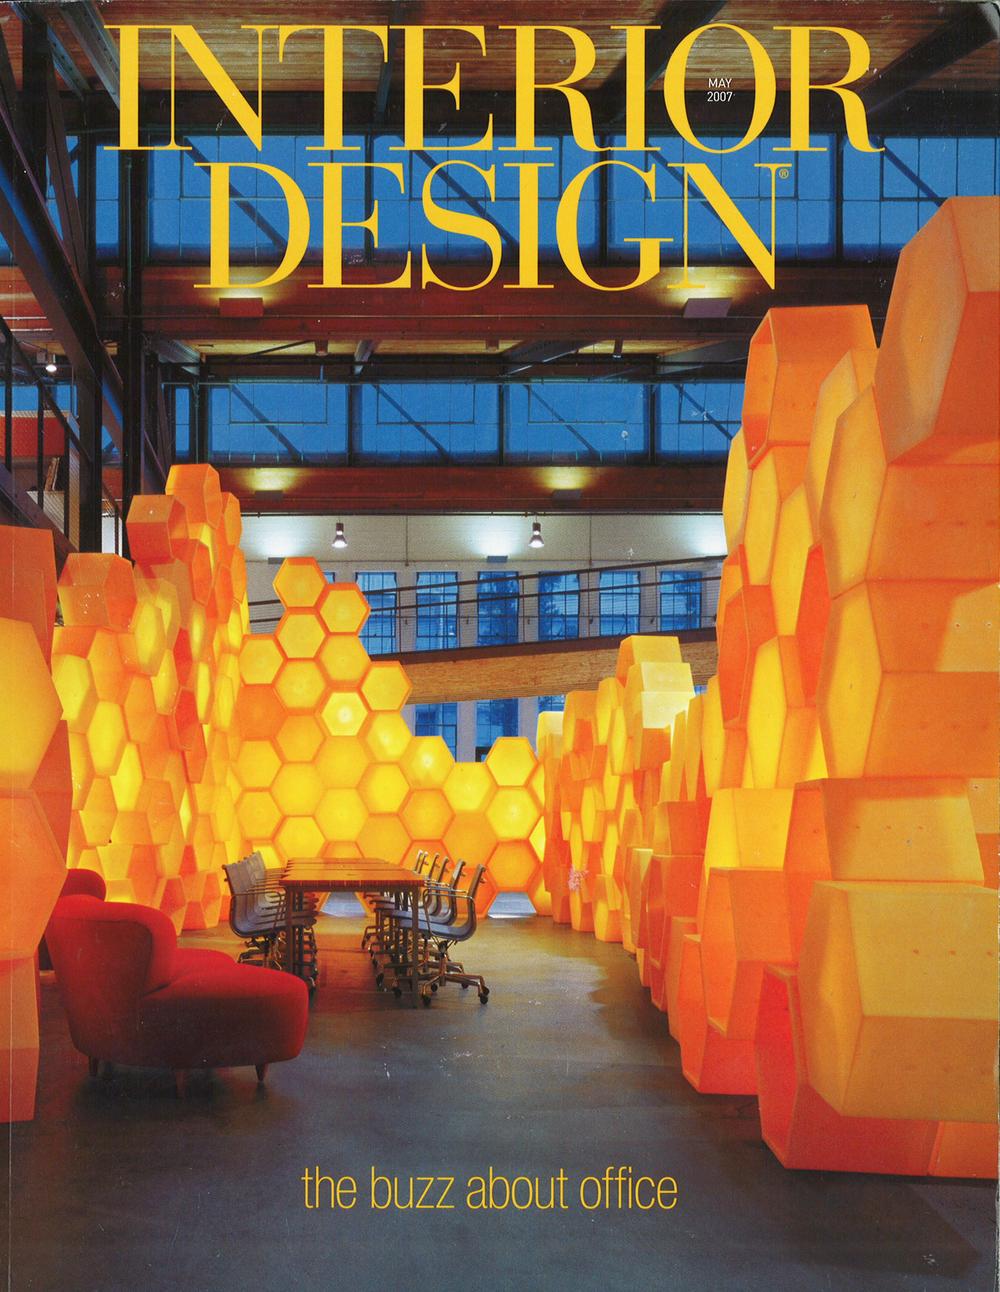 Interior Design - page1.jpg